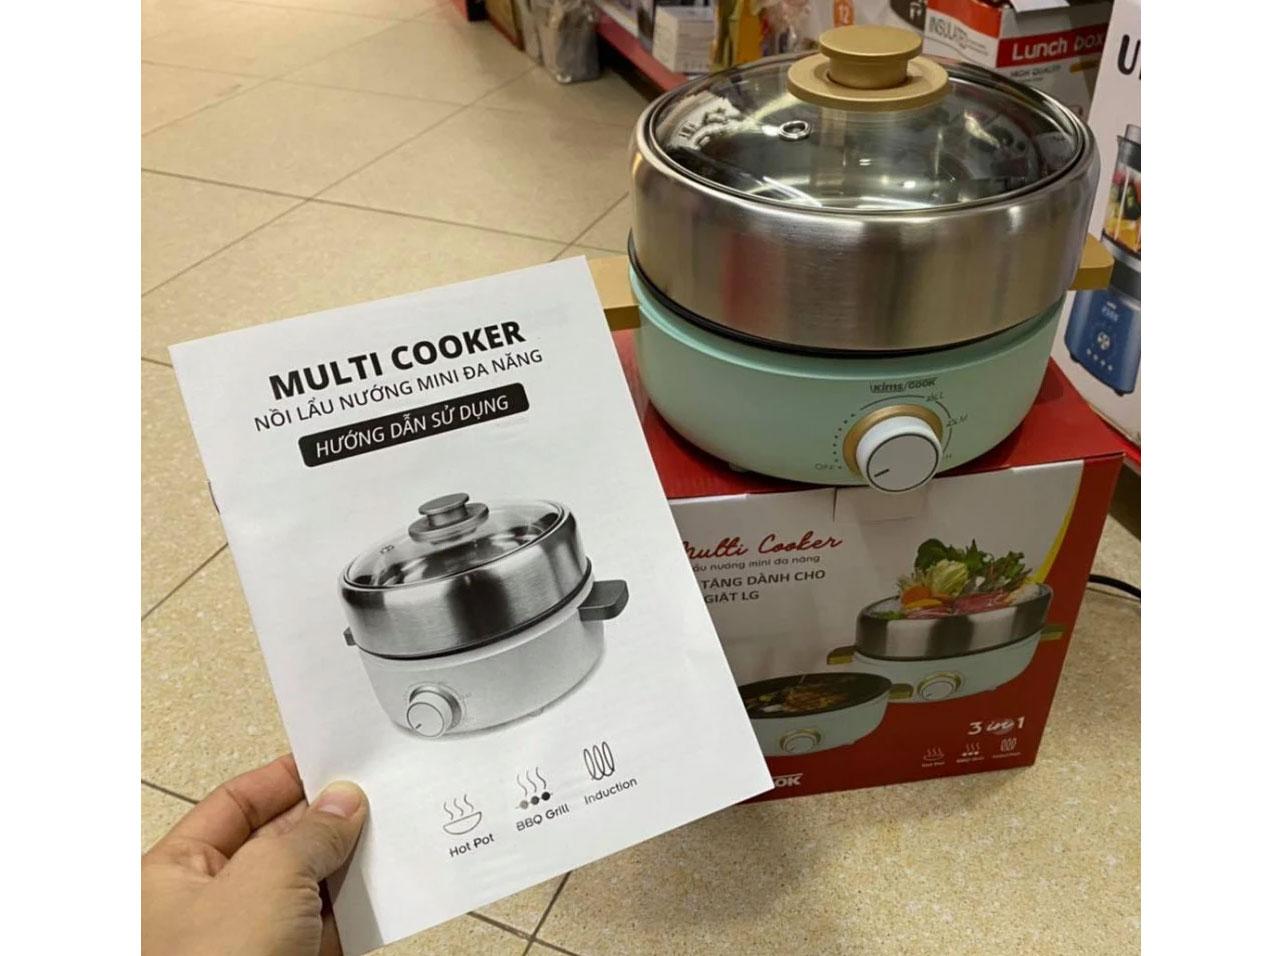 Kims Cook MC520I